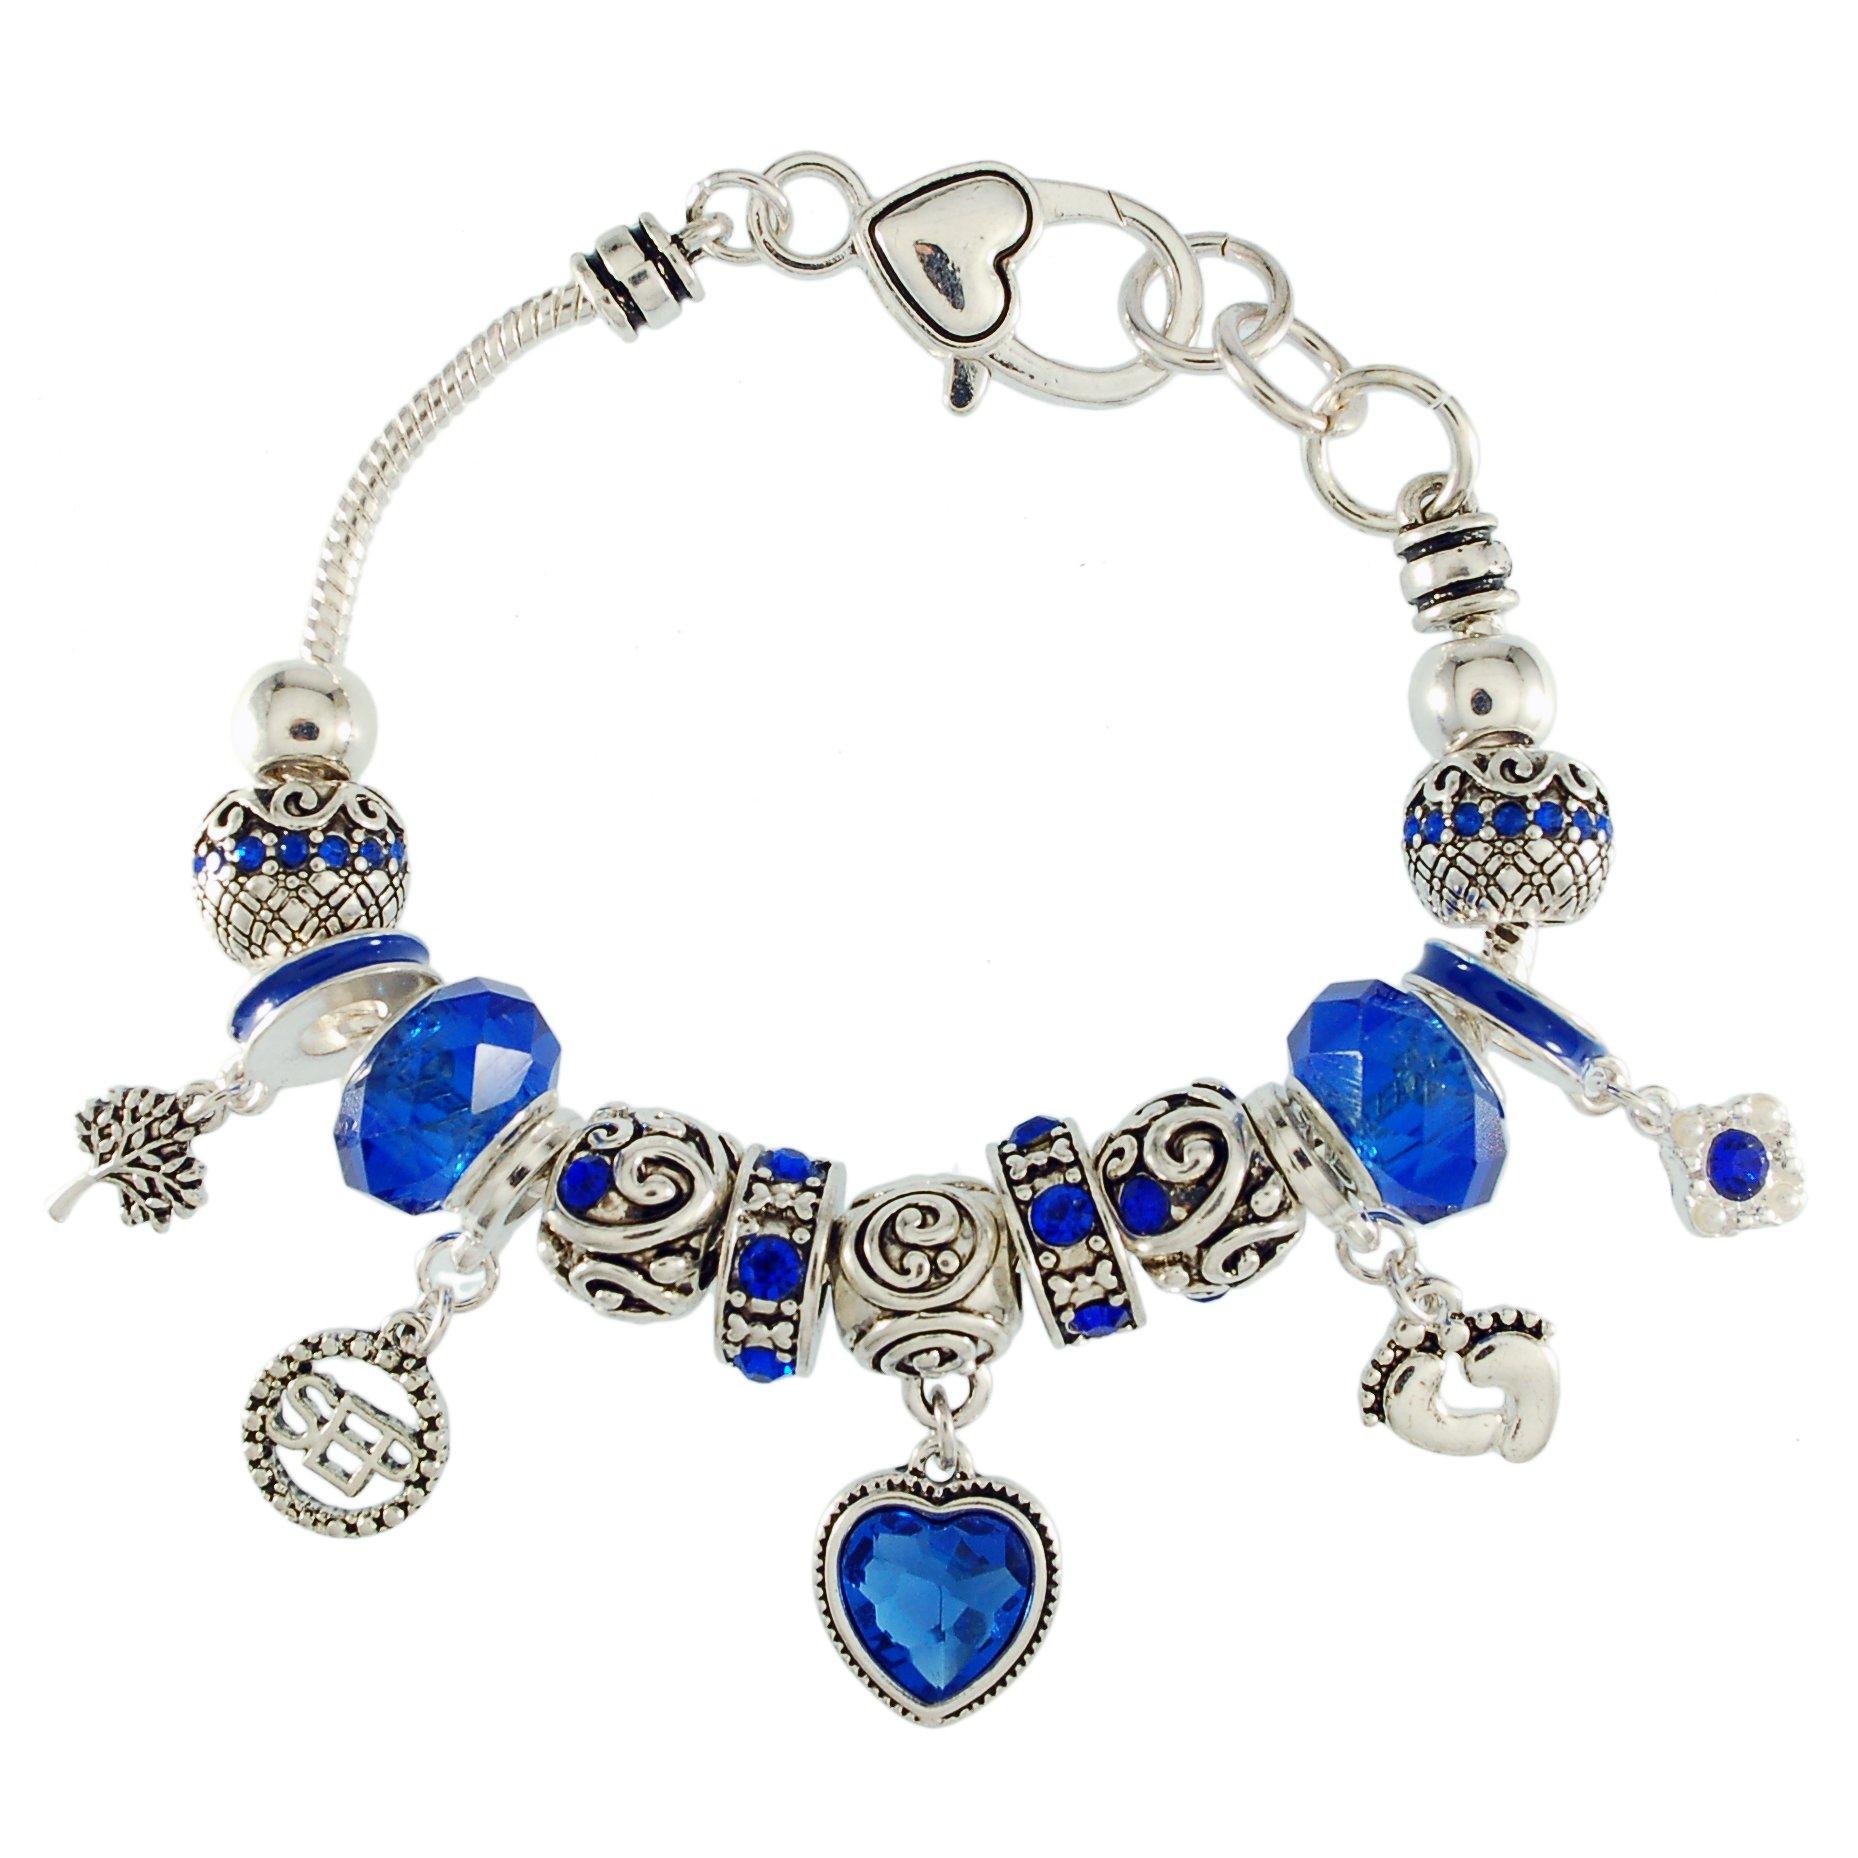 Landau Ambrosia September Birthstone Charm Bracelet